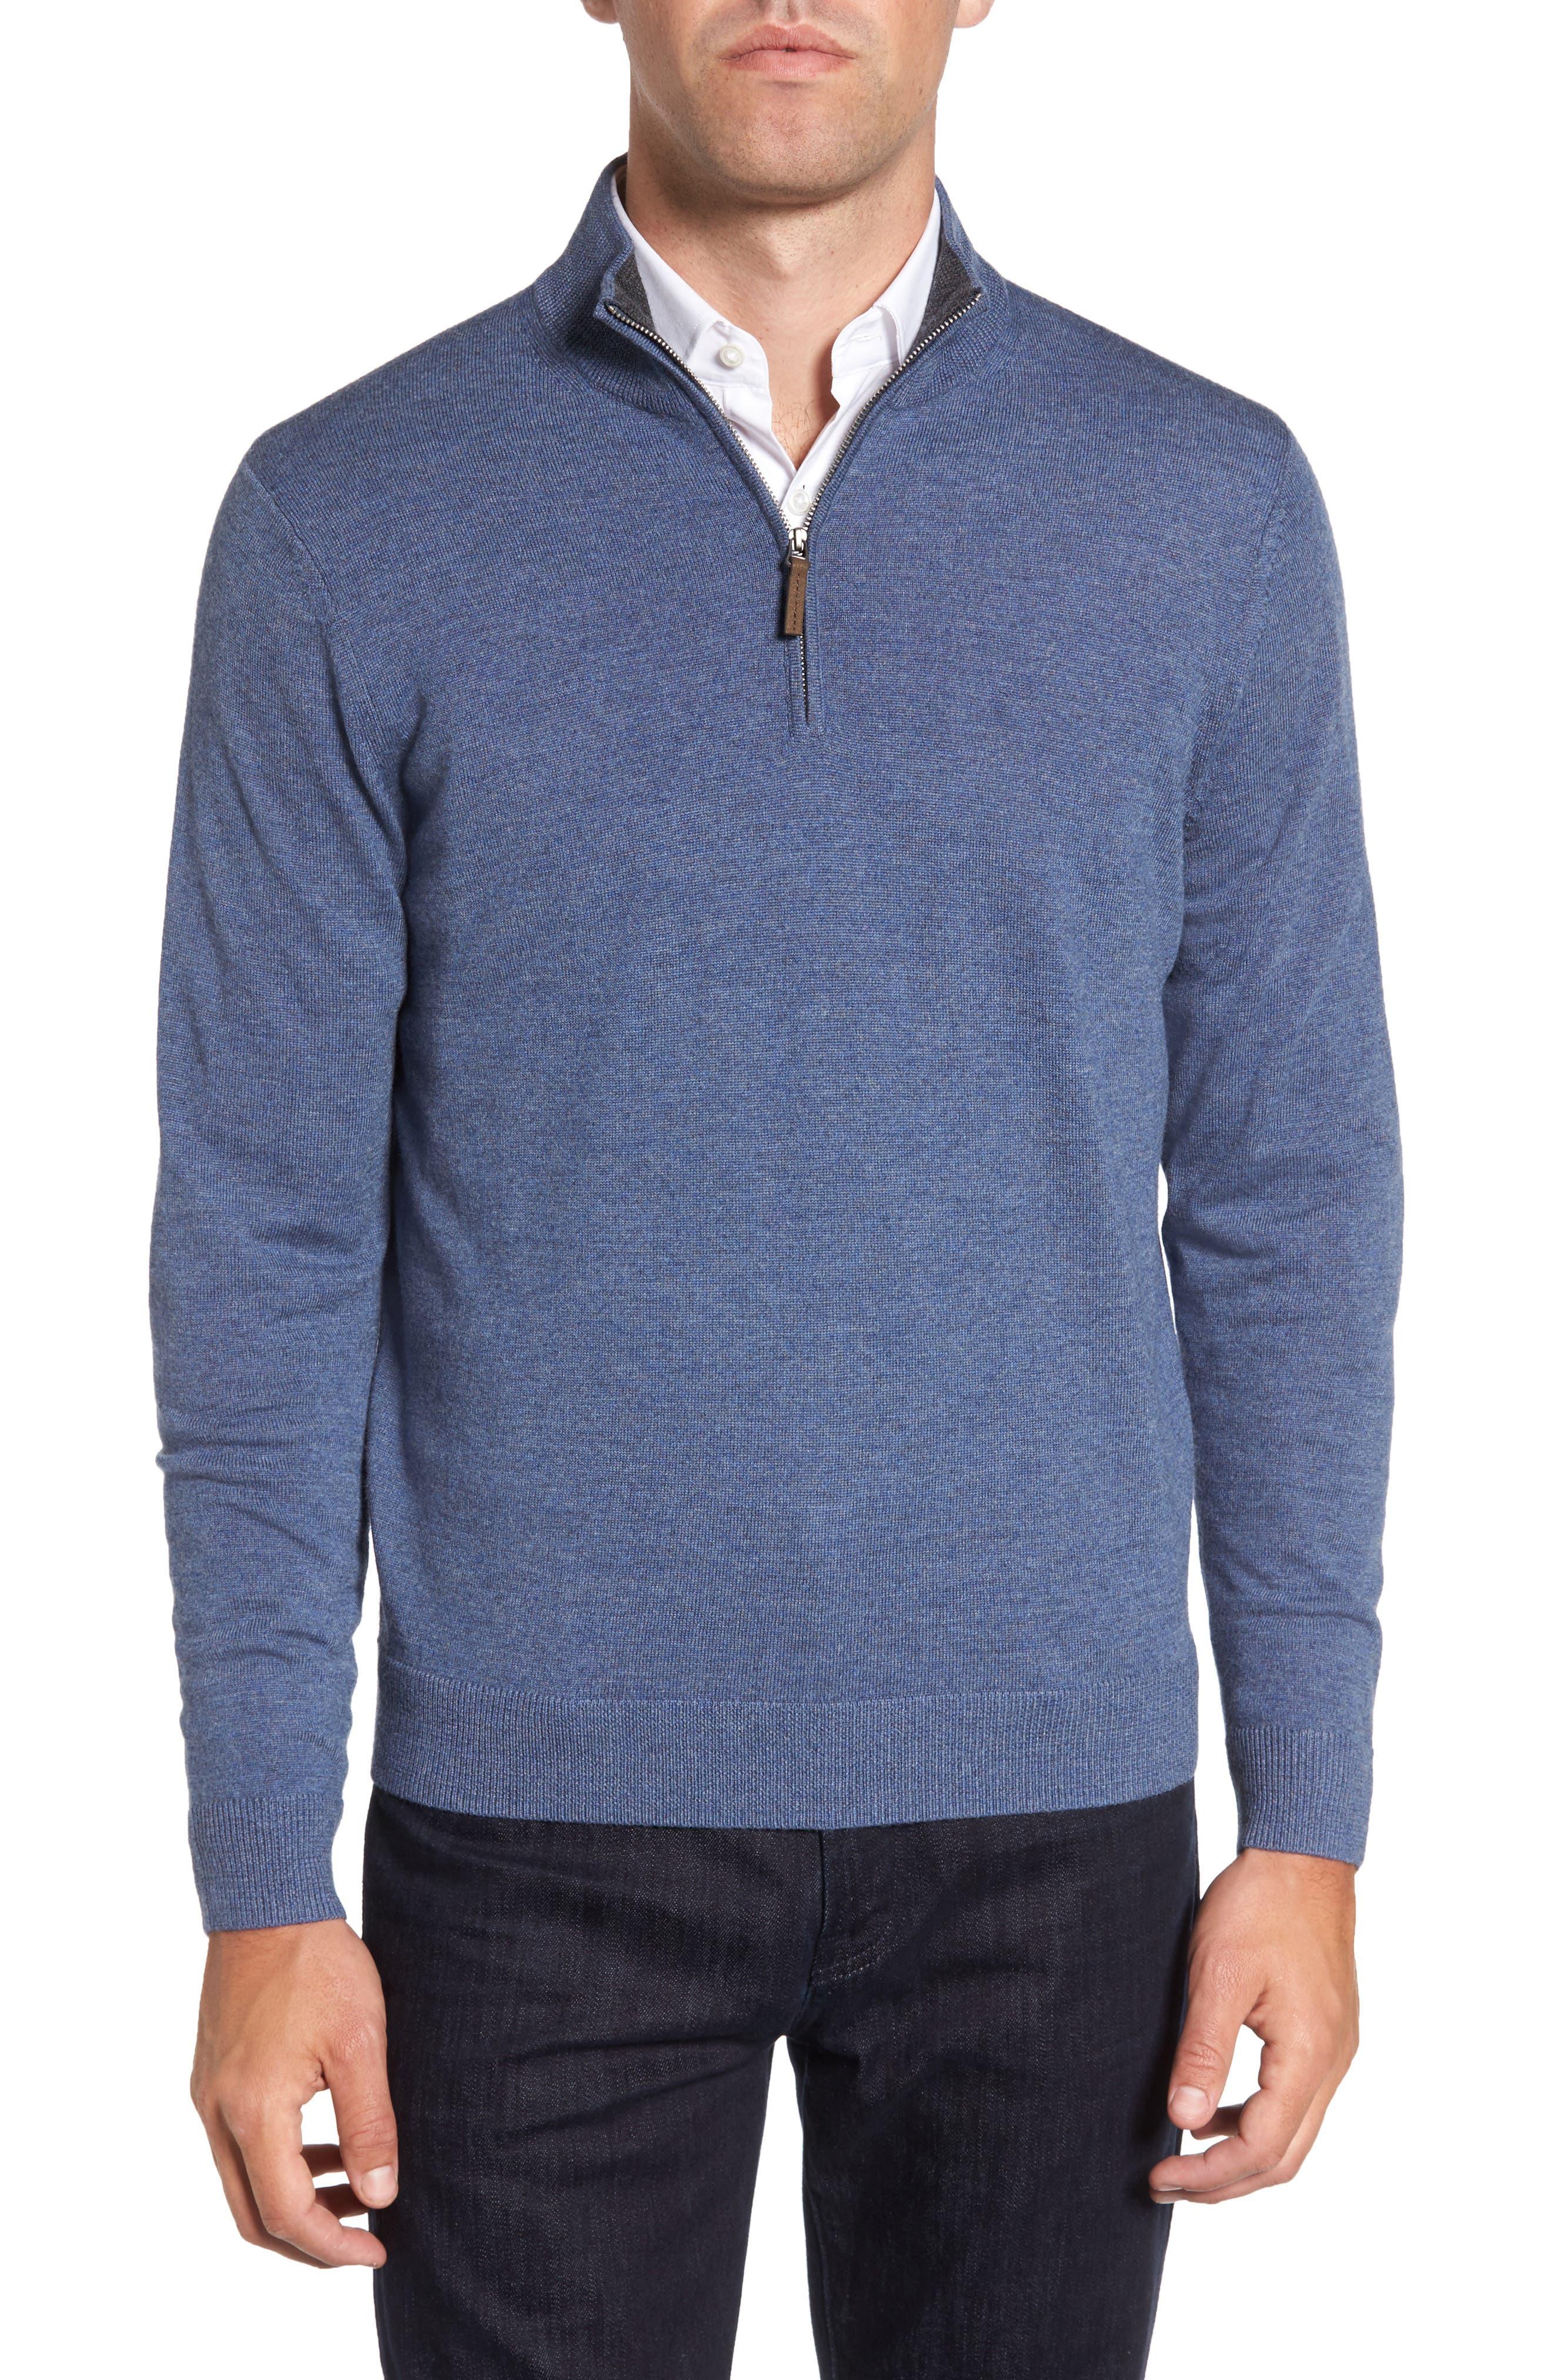 Quarter Zip Merino Wool Pullover,                             Main thumbnail 1, color,                             Navy Crown